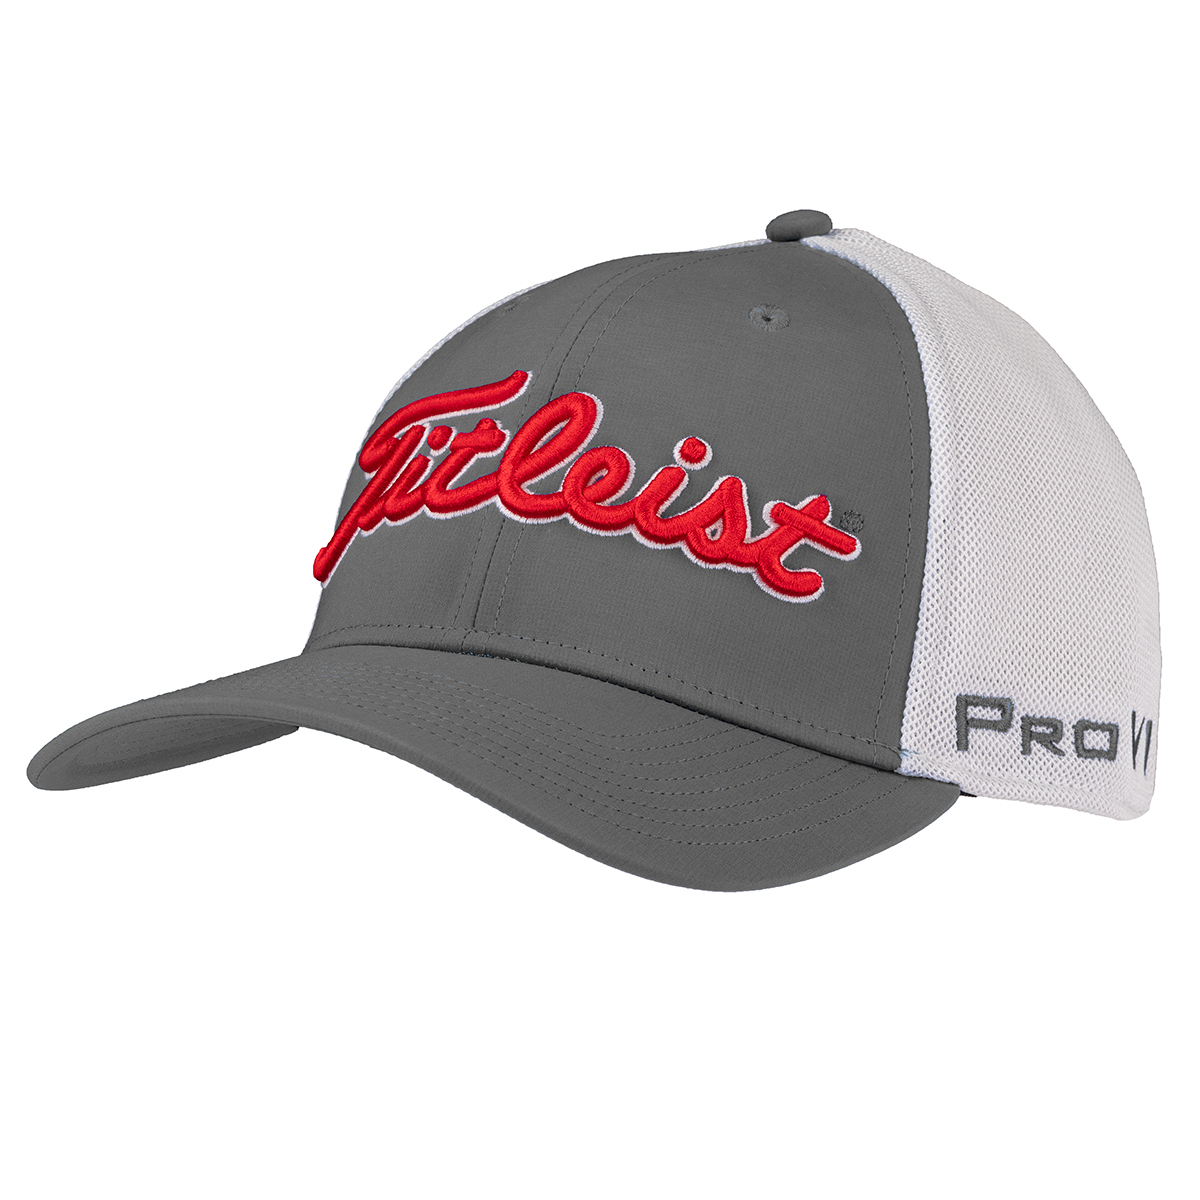 Titleist Men's Tour Sports Two-Tone Mesh Hat